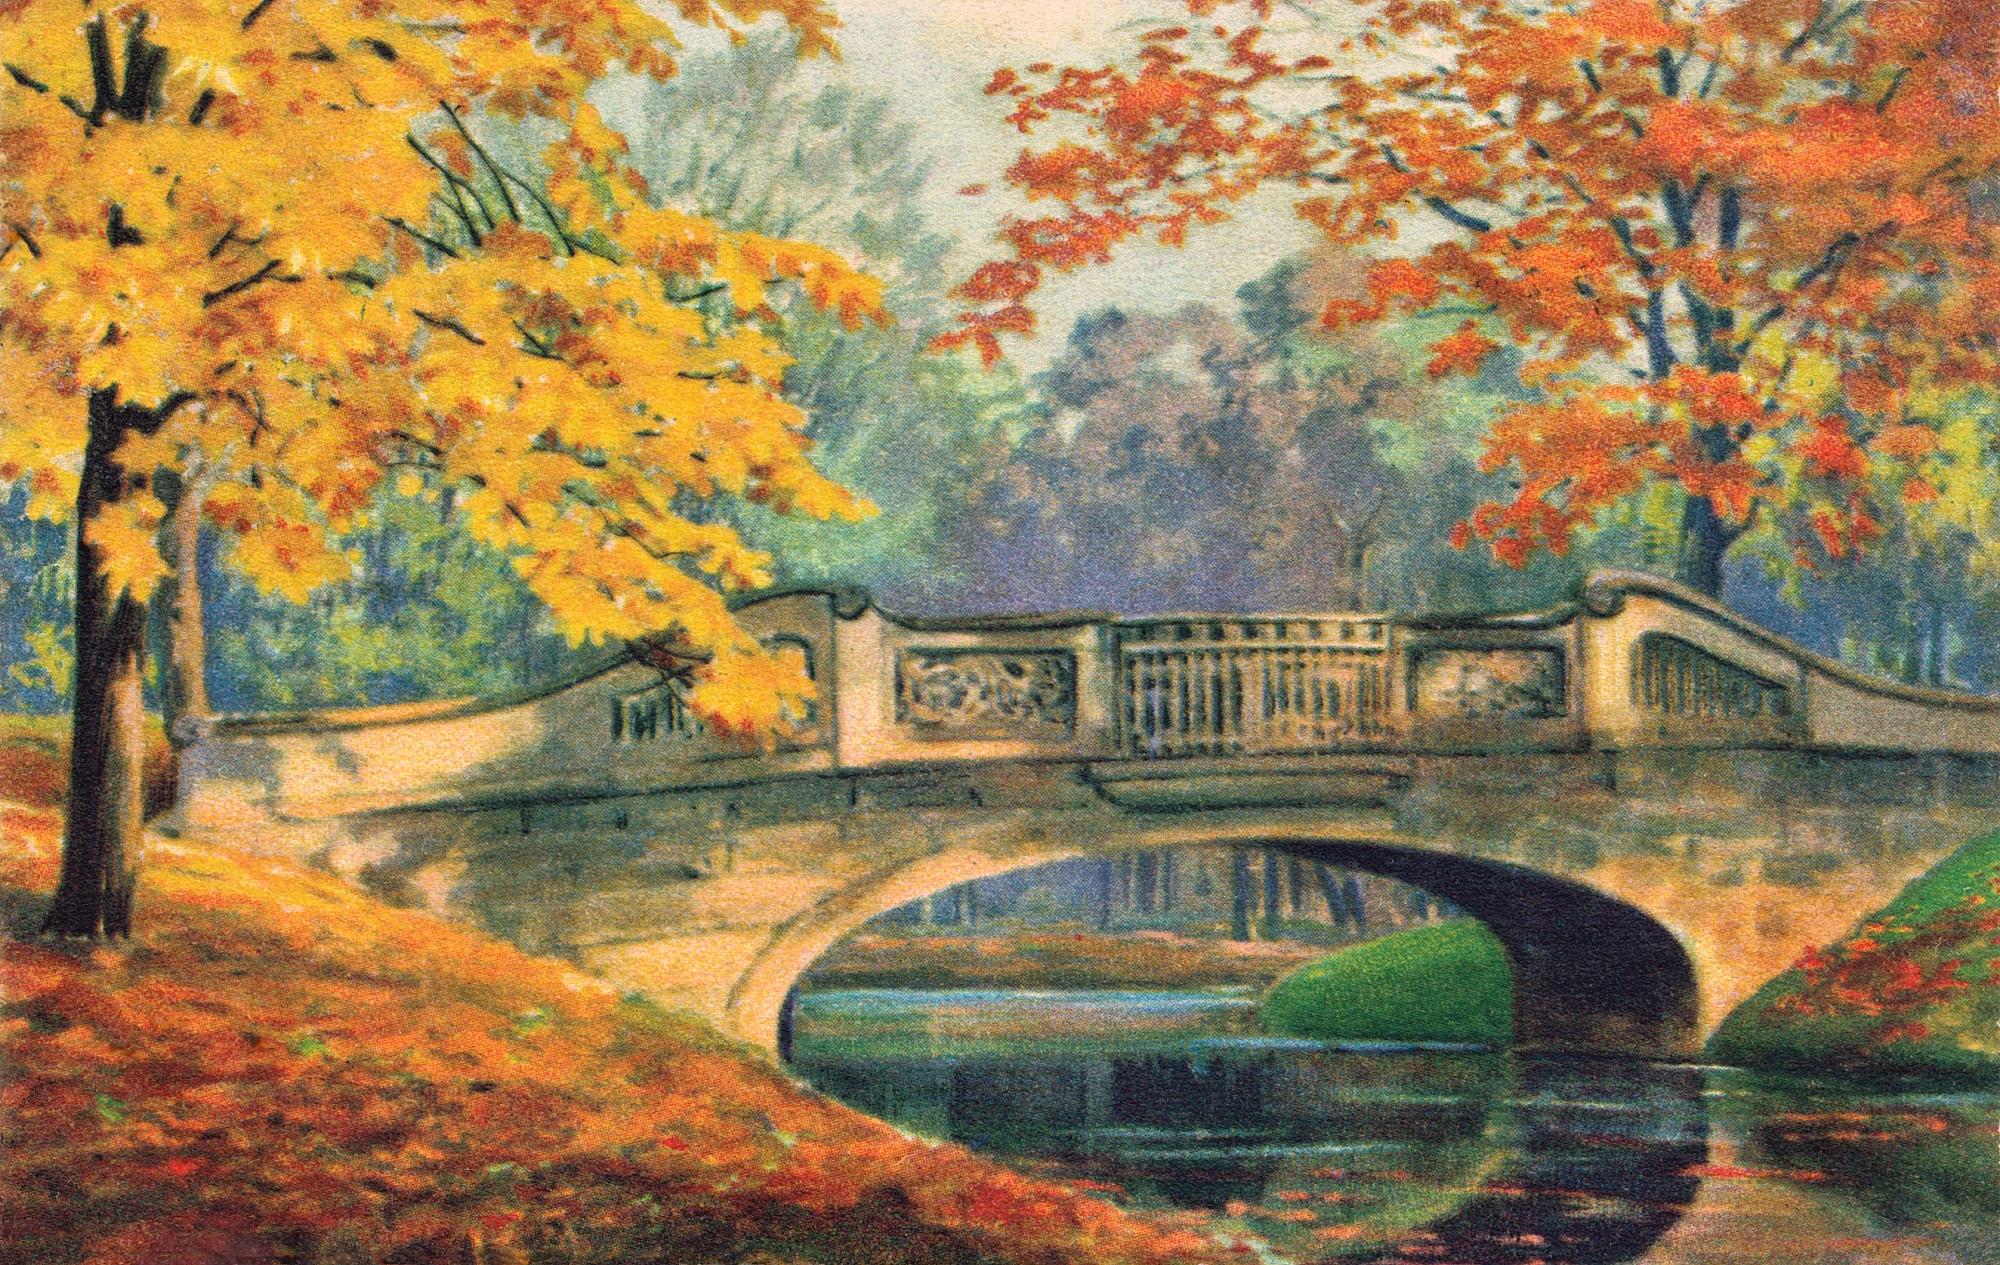 Nr.627 - Wiegandbruecke im Herbst